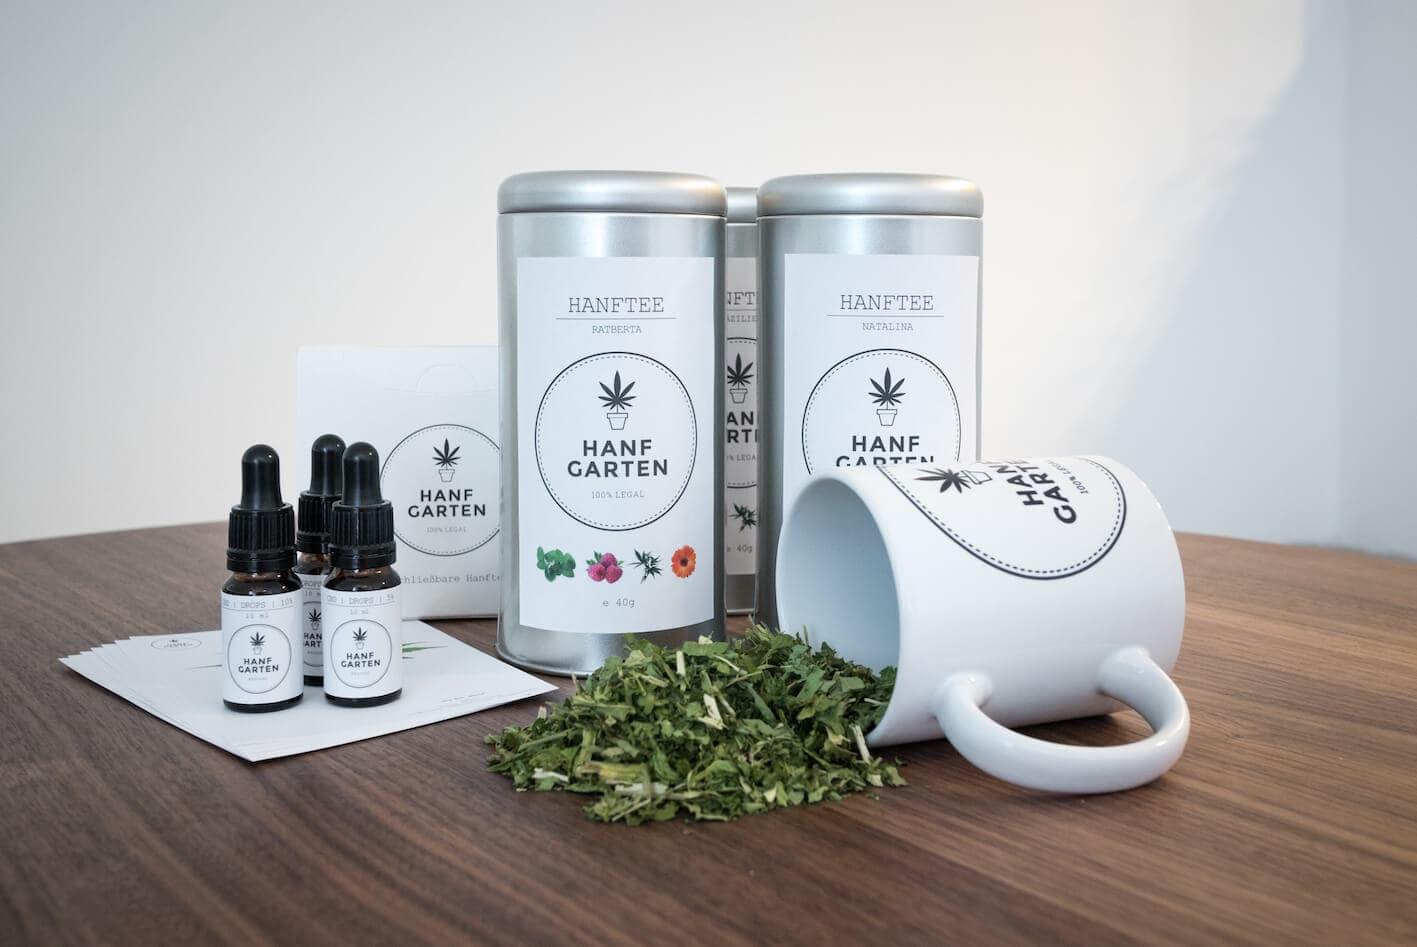 Bild2_Hanfgarten-Produkte